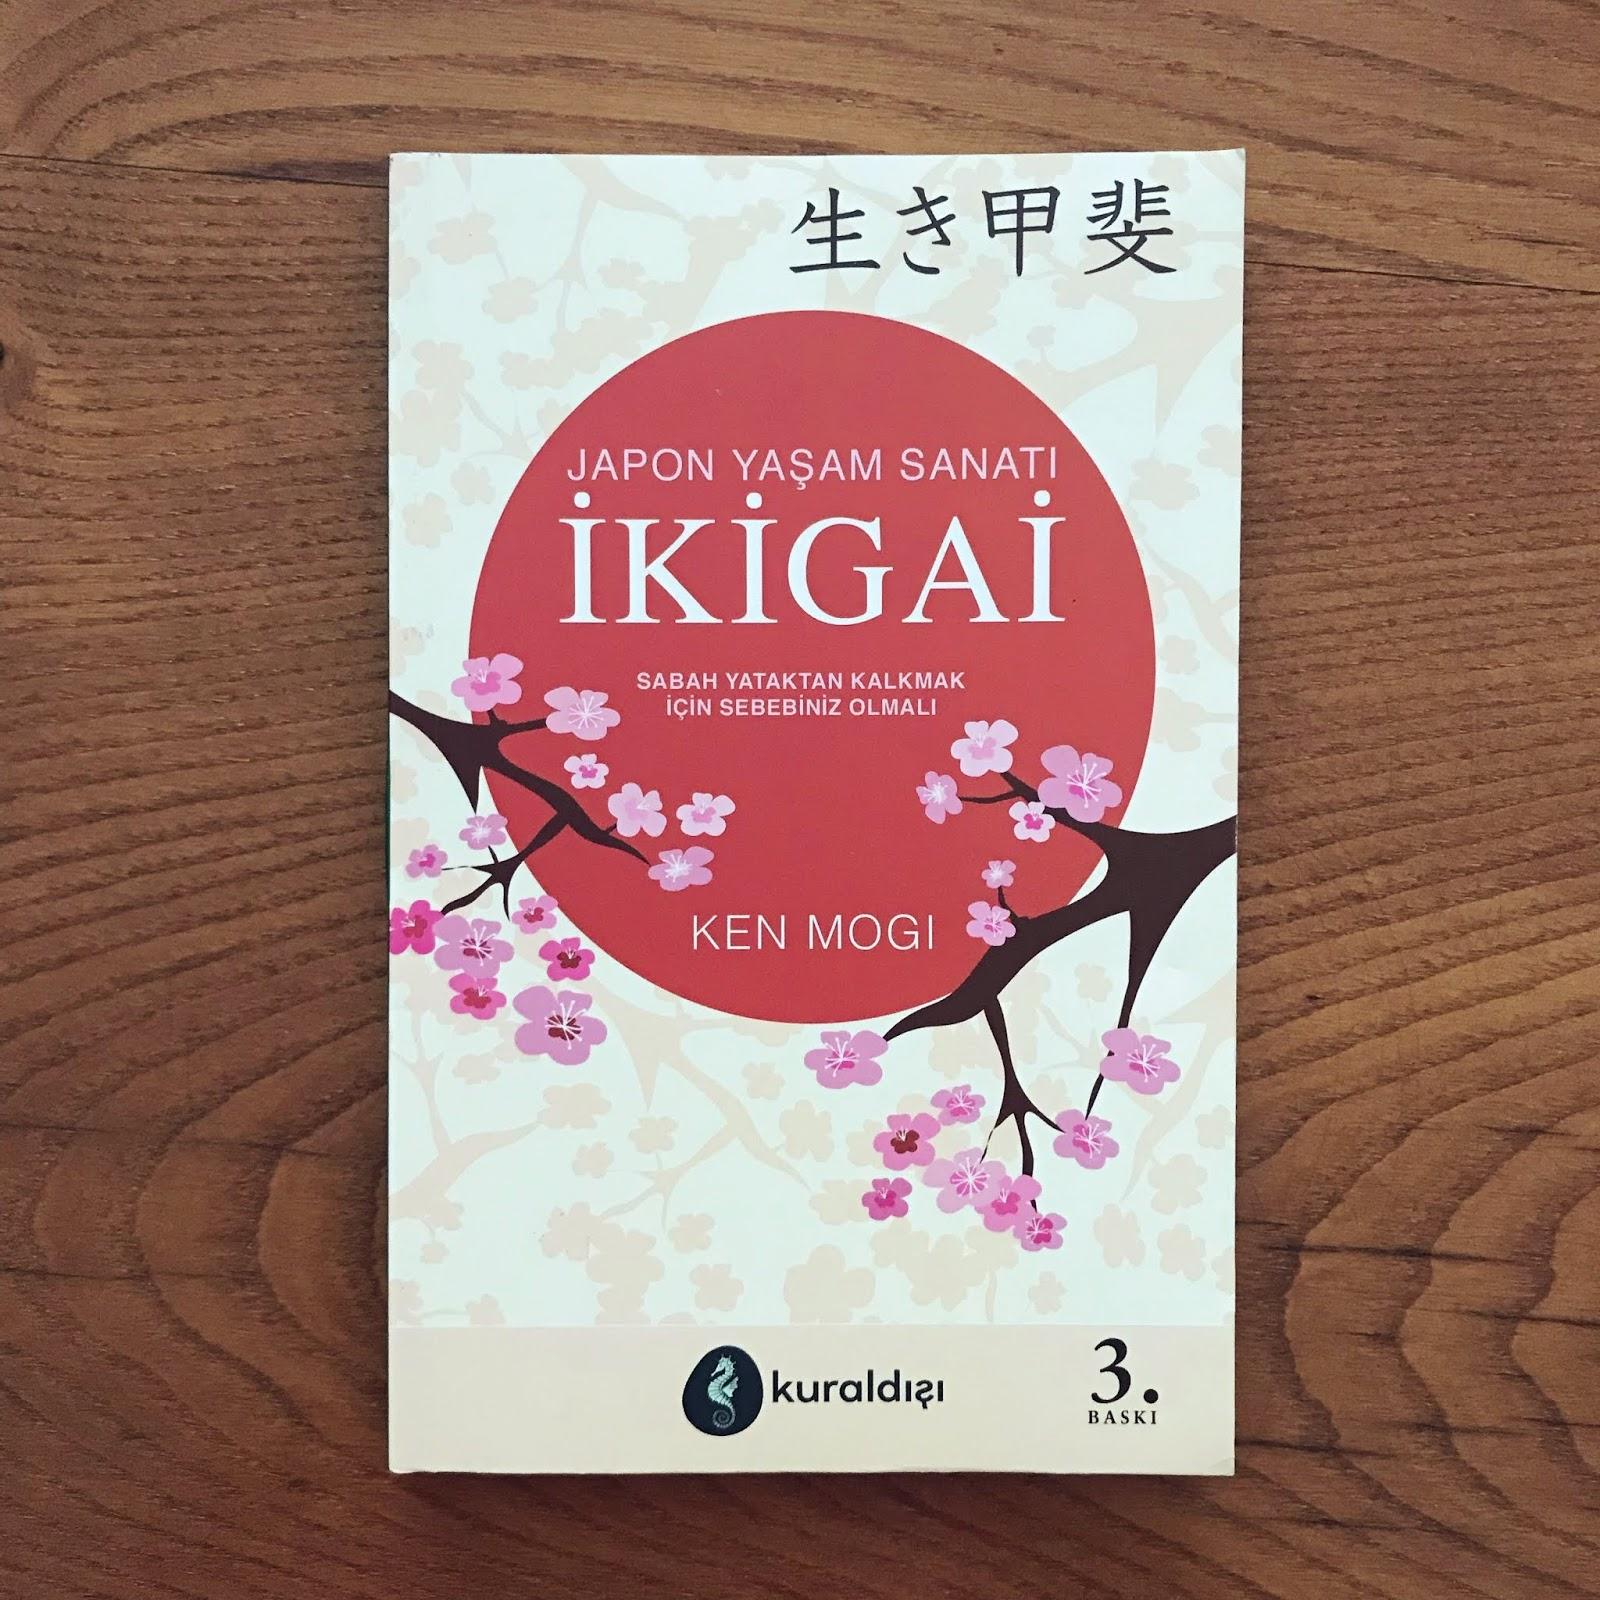 Ikigai - Japon Yasam Sanati